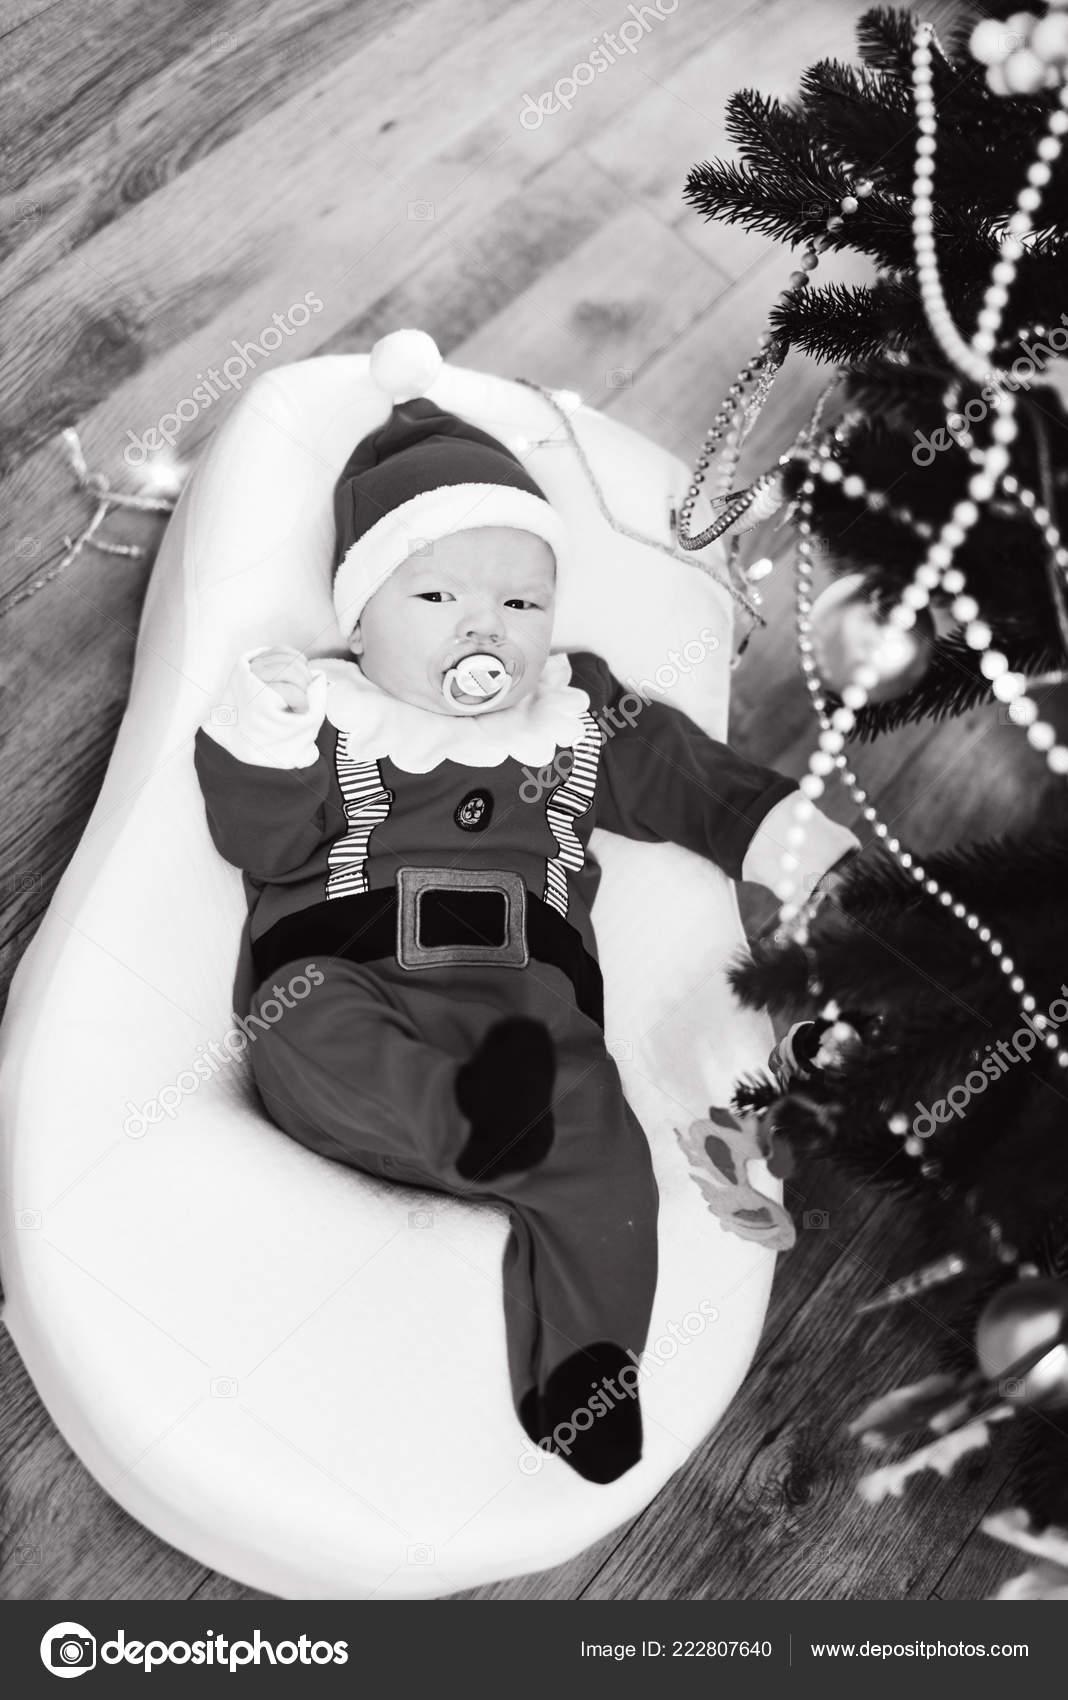 403e86cf92c5 Newborn Baby Boy Wearing Santa Clothes Christmas Tree — Stock Photo ...